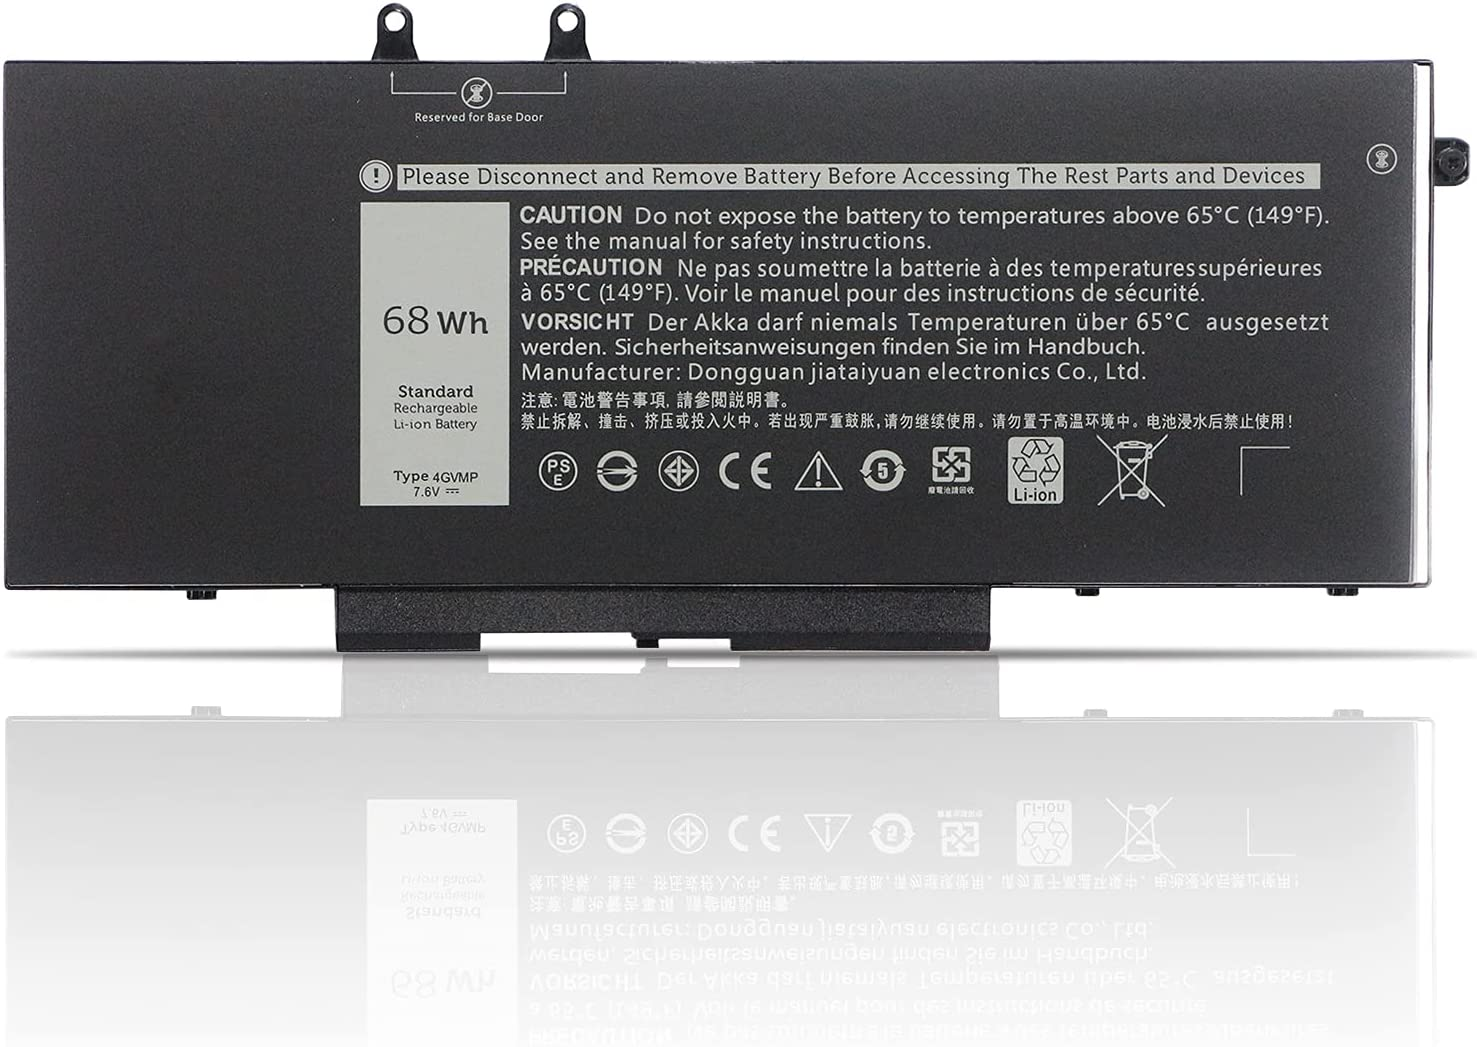 K KYUER 68Wh 4GVMP Laptop Batería Repuesto para Dell Latitude 5400 E5400 5410 E5410 5500 E5500 5510 E5510 Precision 3540 M3540 3550 M3550 Inspiron 7590 7591 7791 2-in-1 Series 1V1XF R8D7N 04GVMP 7.6V